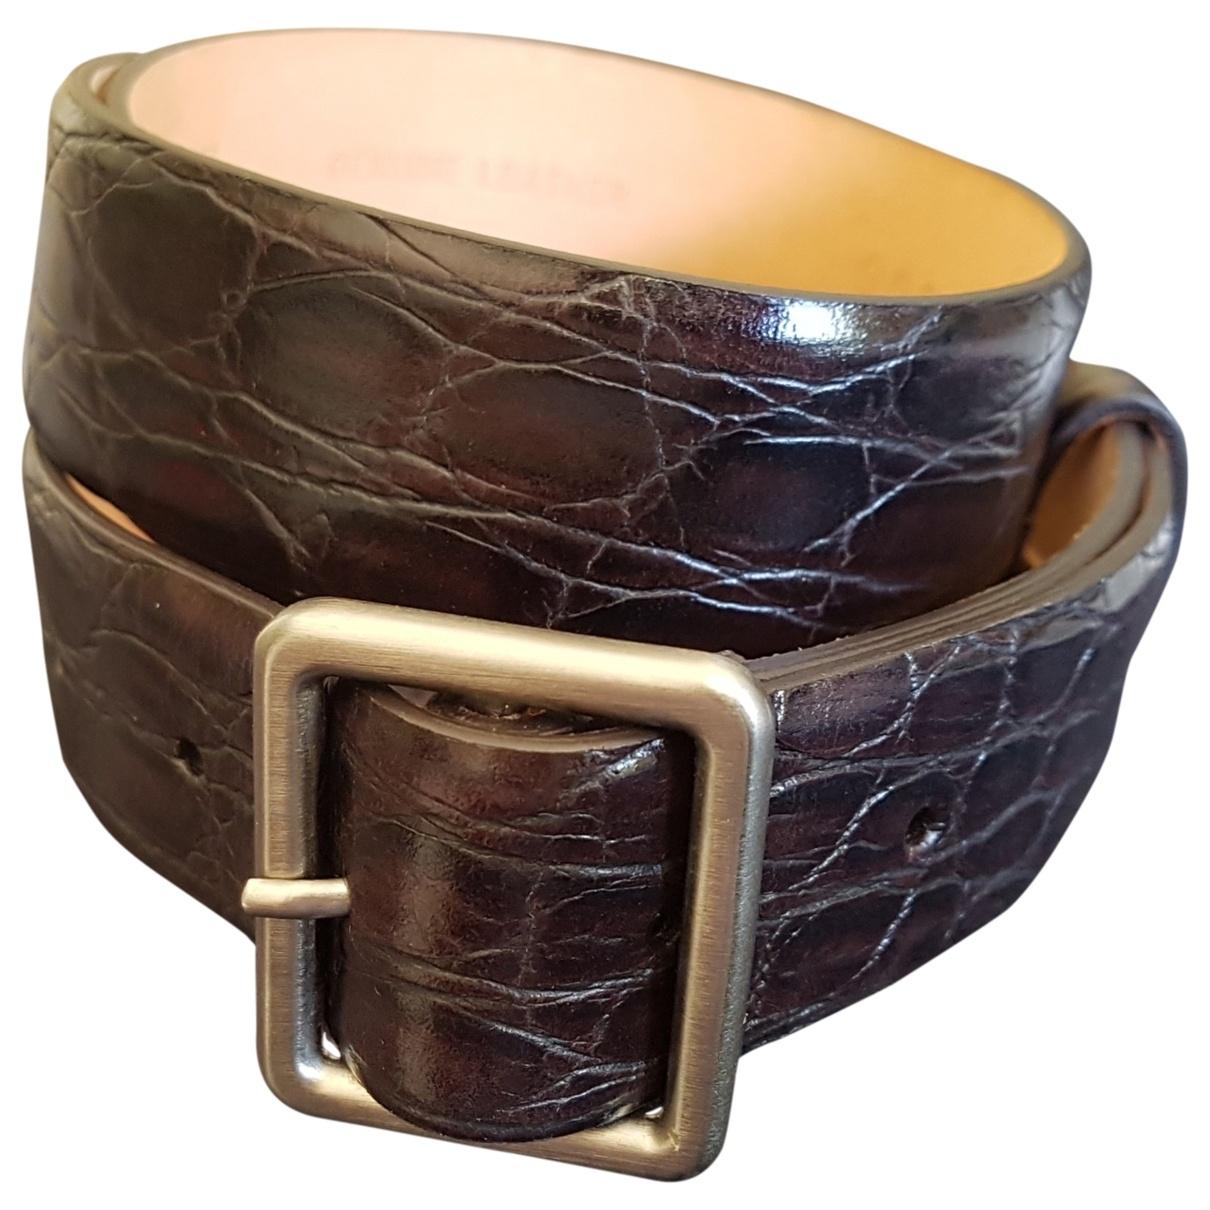 Cinturon de Cocodrilo Giorgio Armani